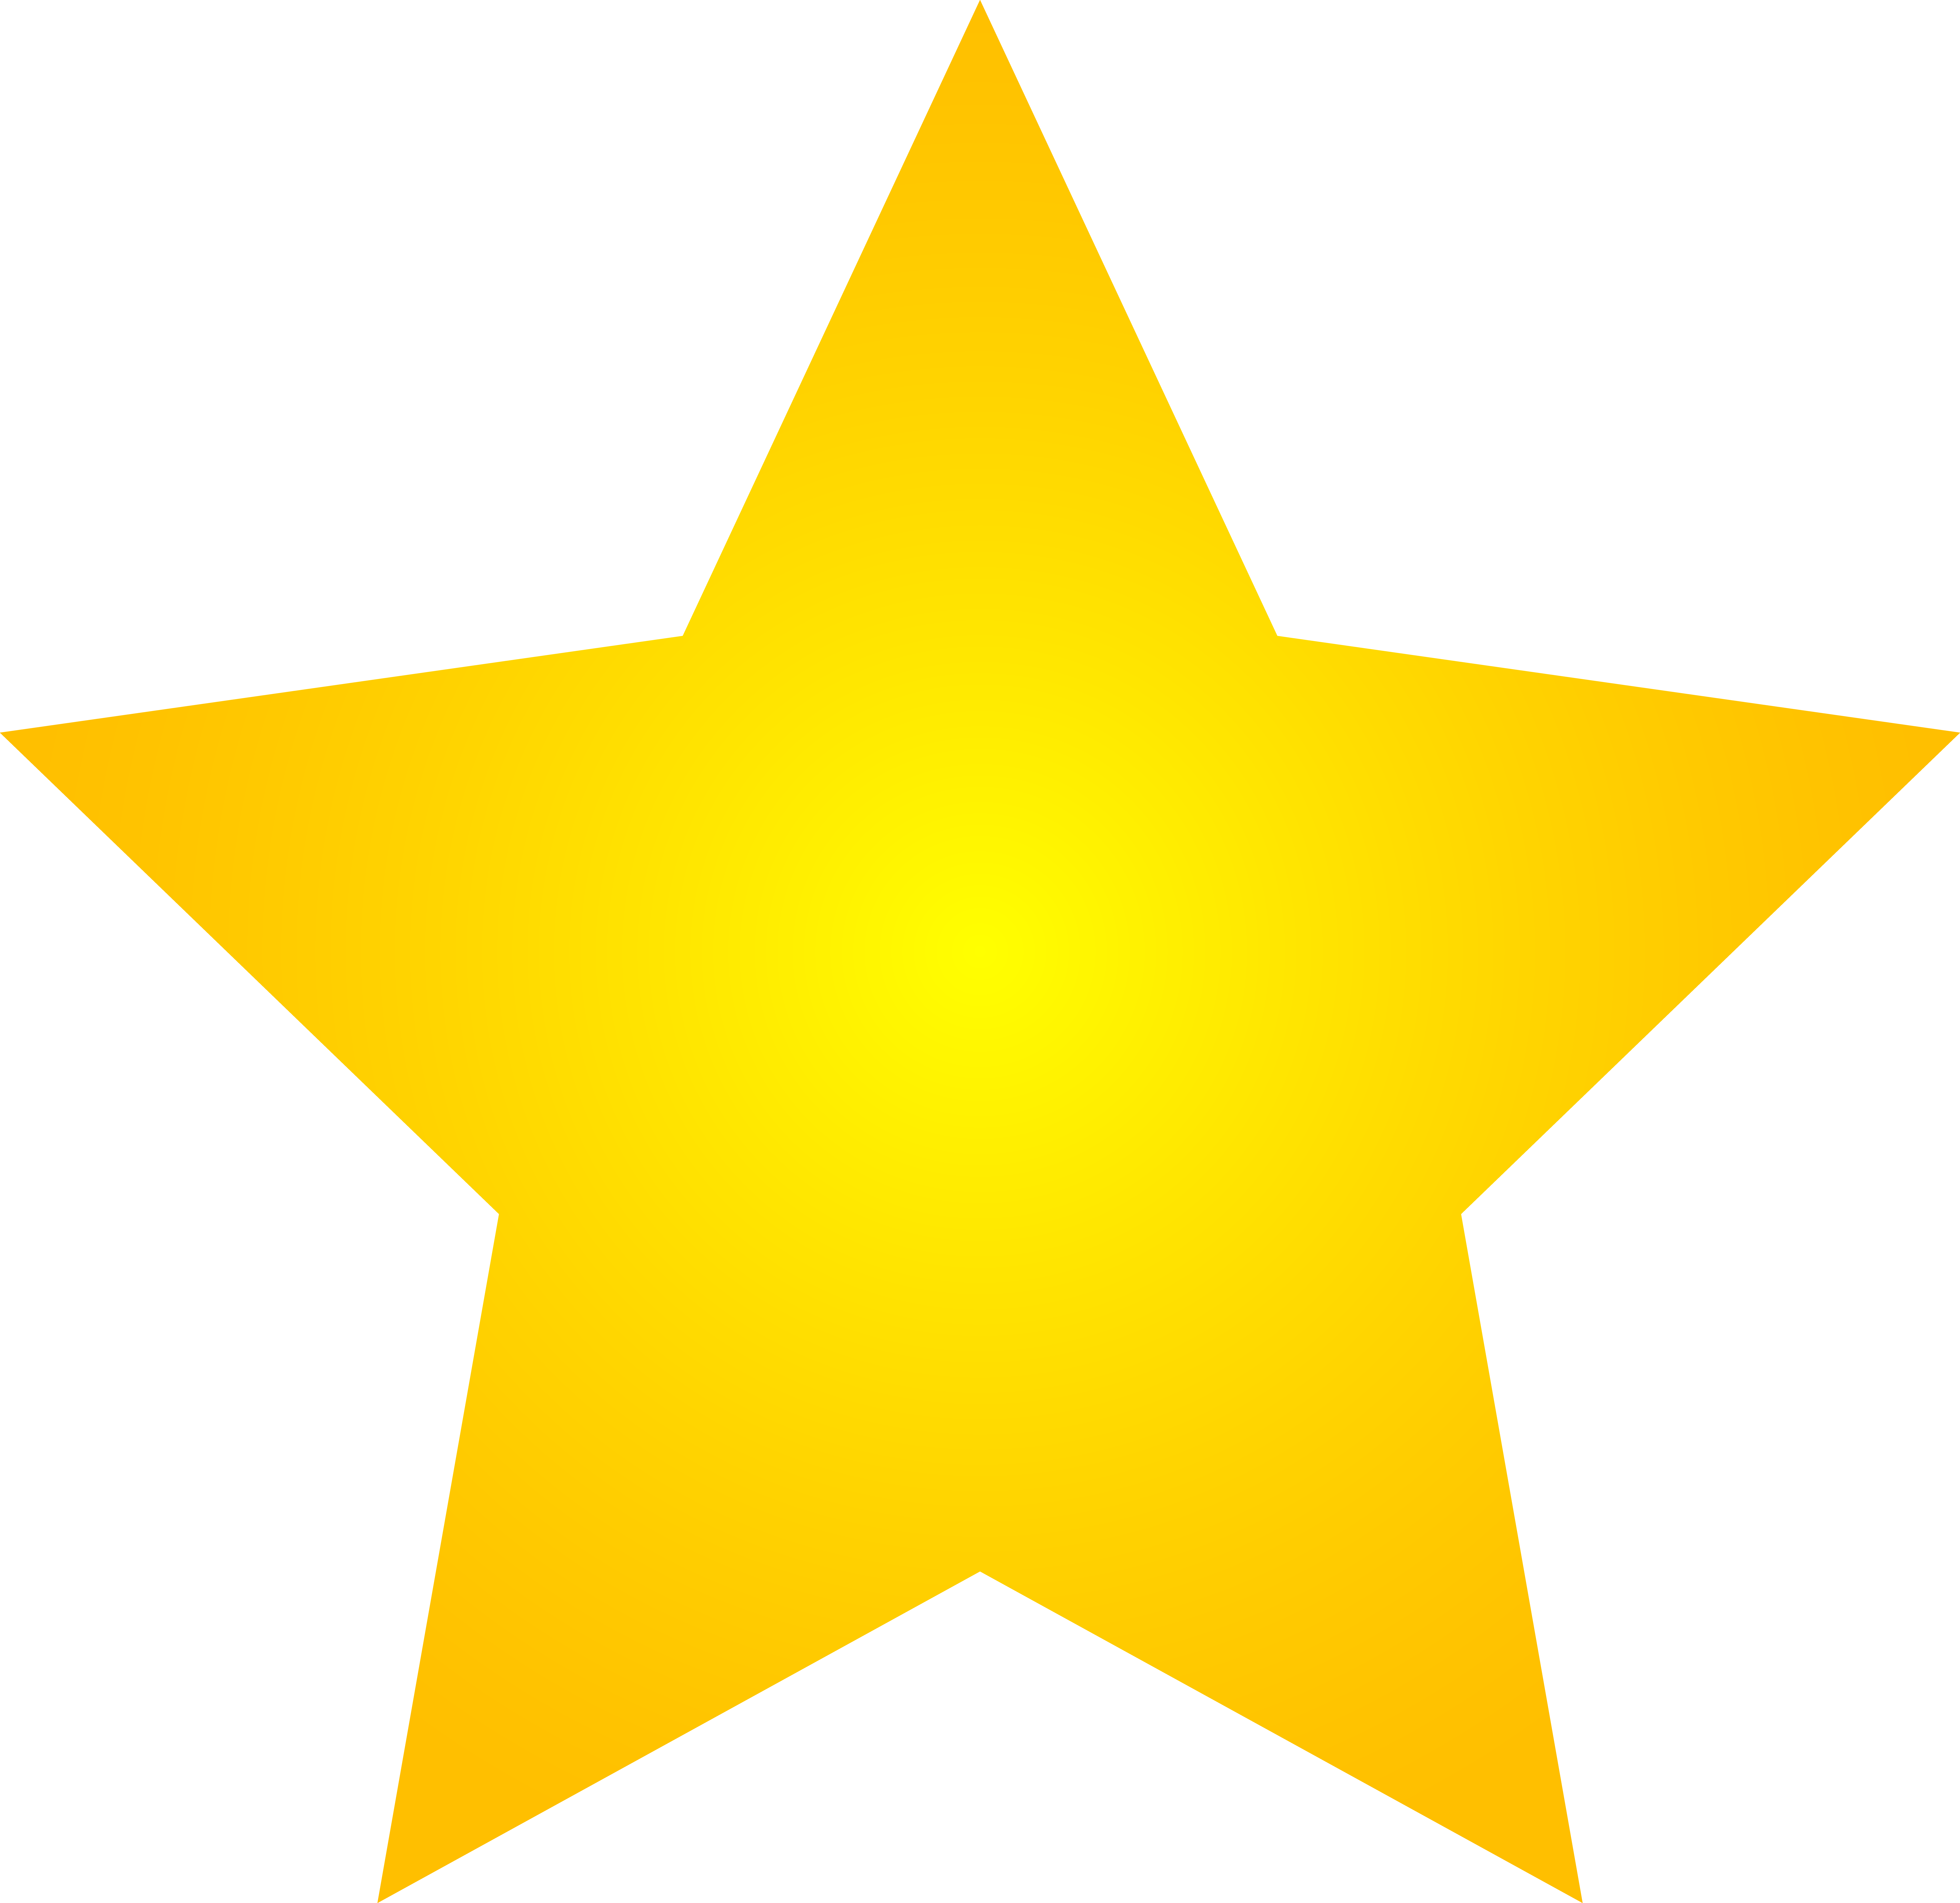 huge gold star clipart panda free clipart images rh clipartpanda com Gold Star Clip Art Figure Gold Foil Star Clip Art